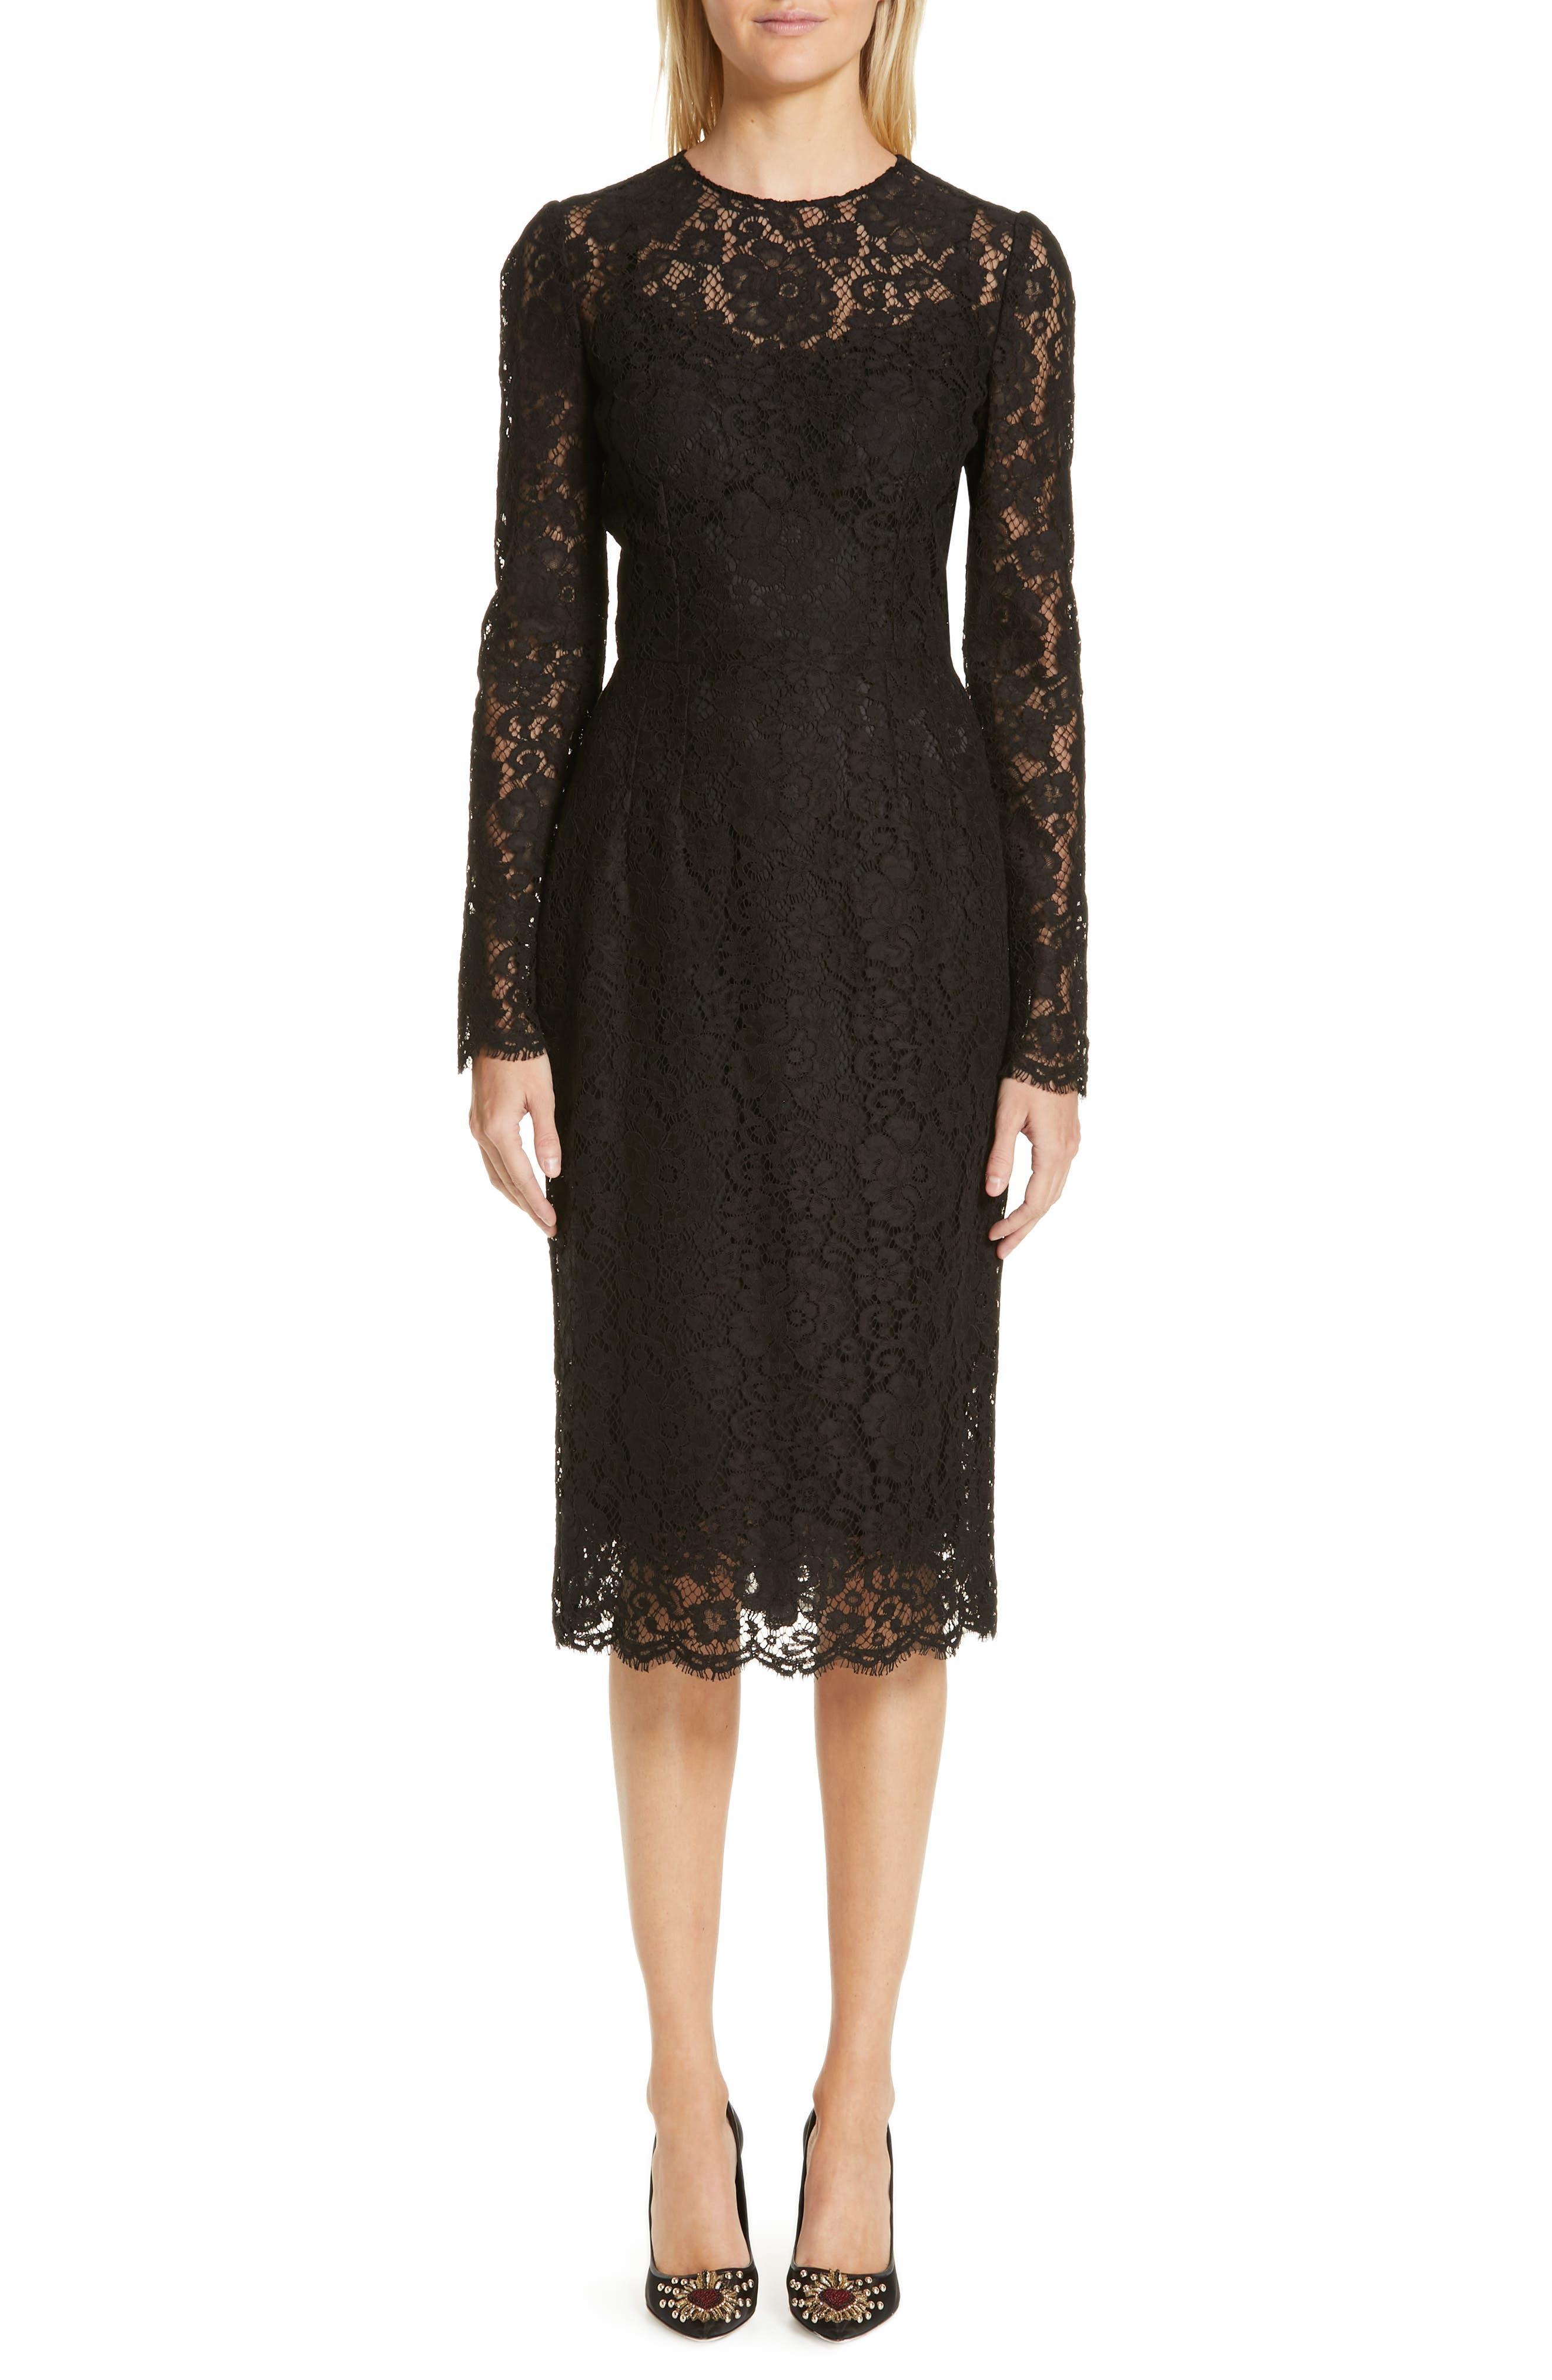 Dolce & gabbana Lace Pencil Dress, US / 40 IT - Black